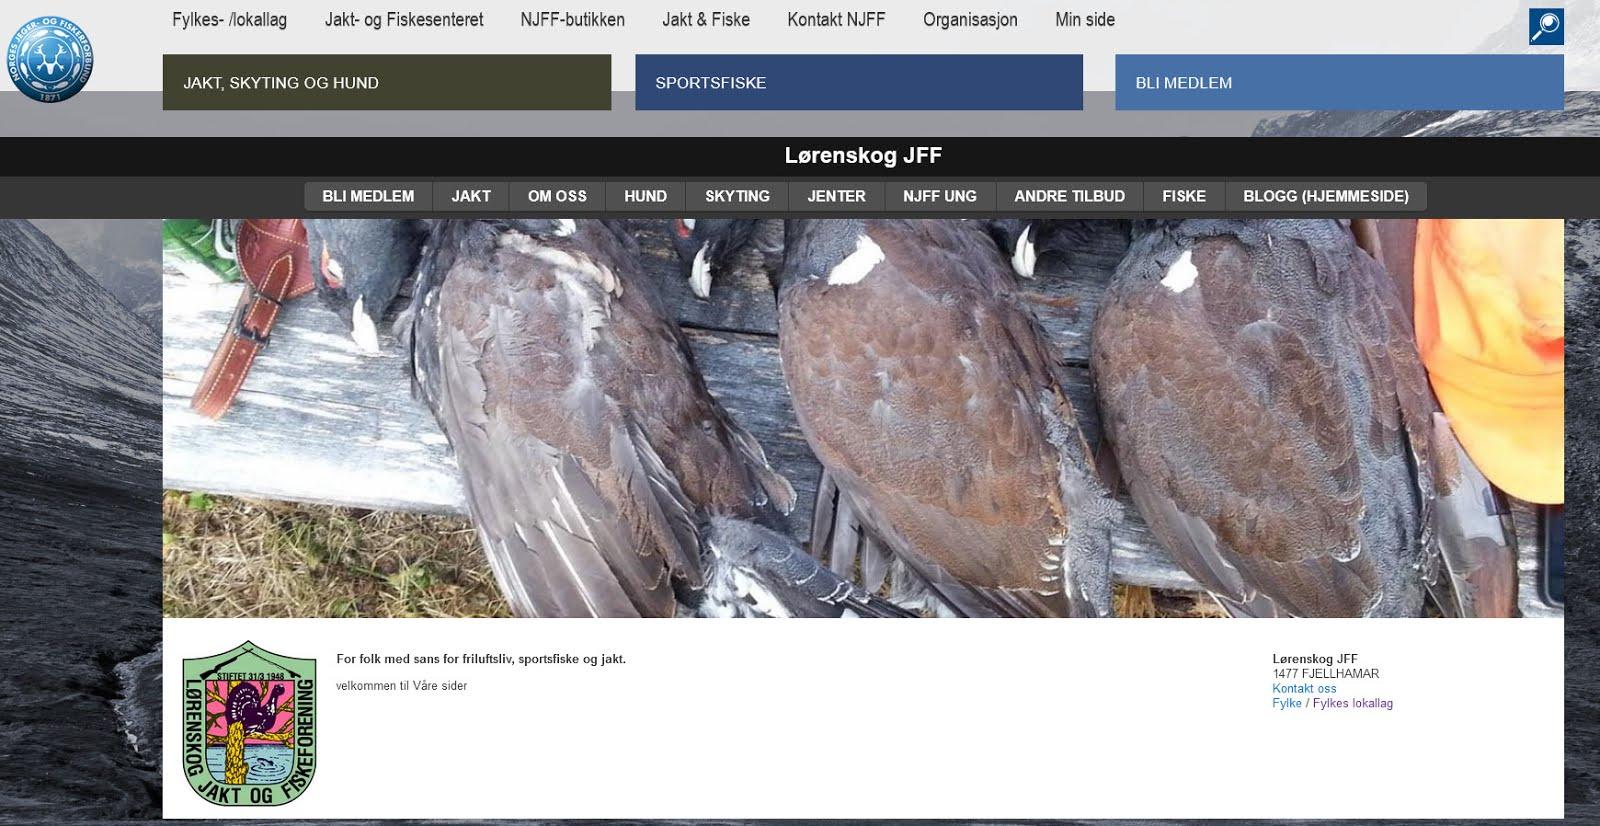 LJFF Aktivitetskalender se ned på siden